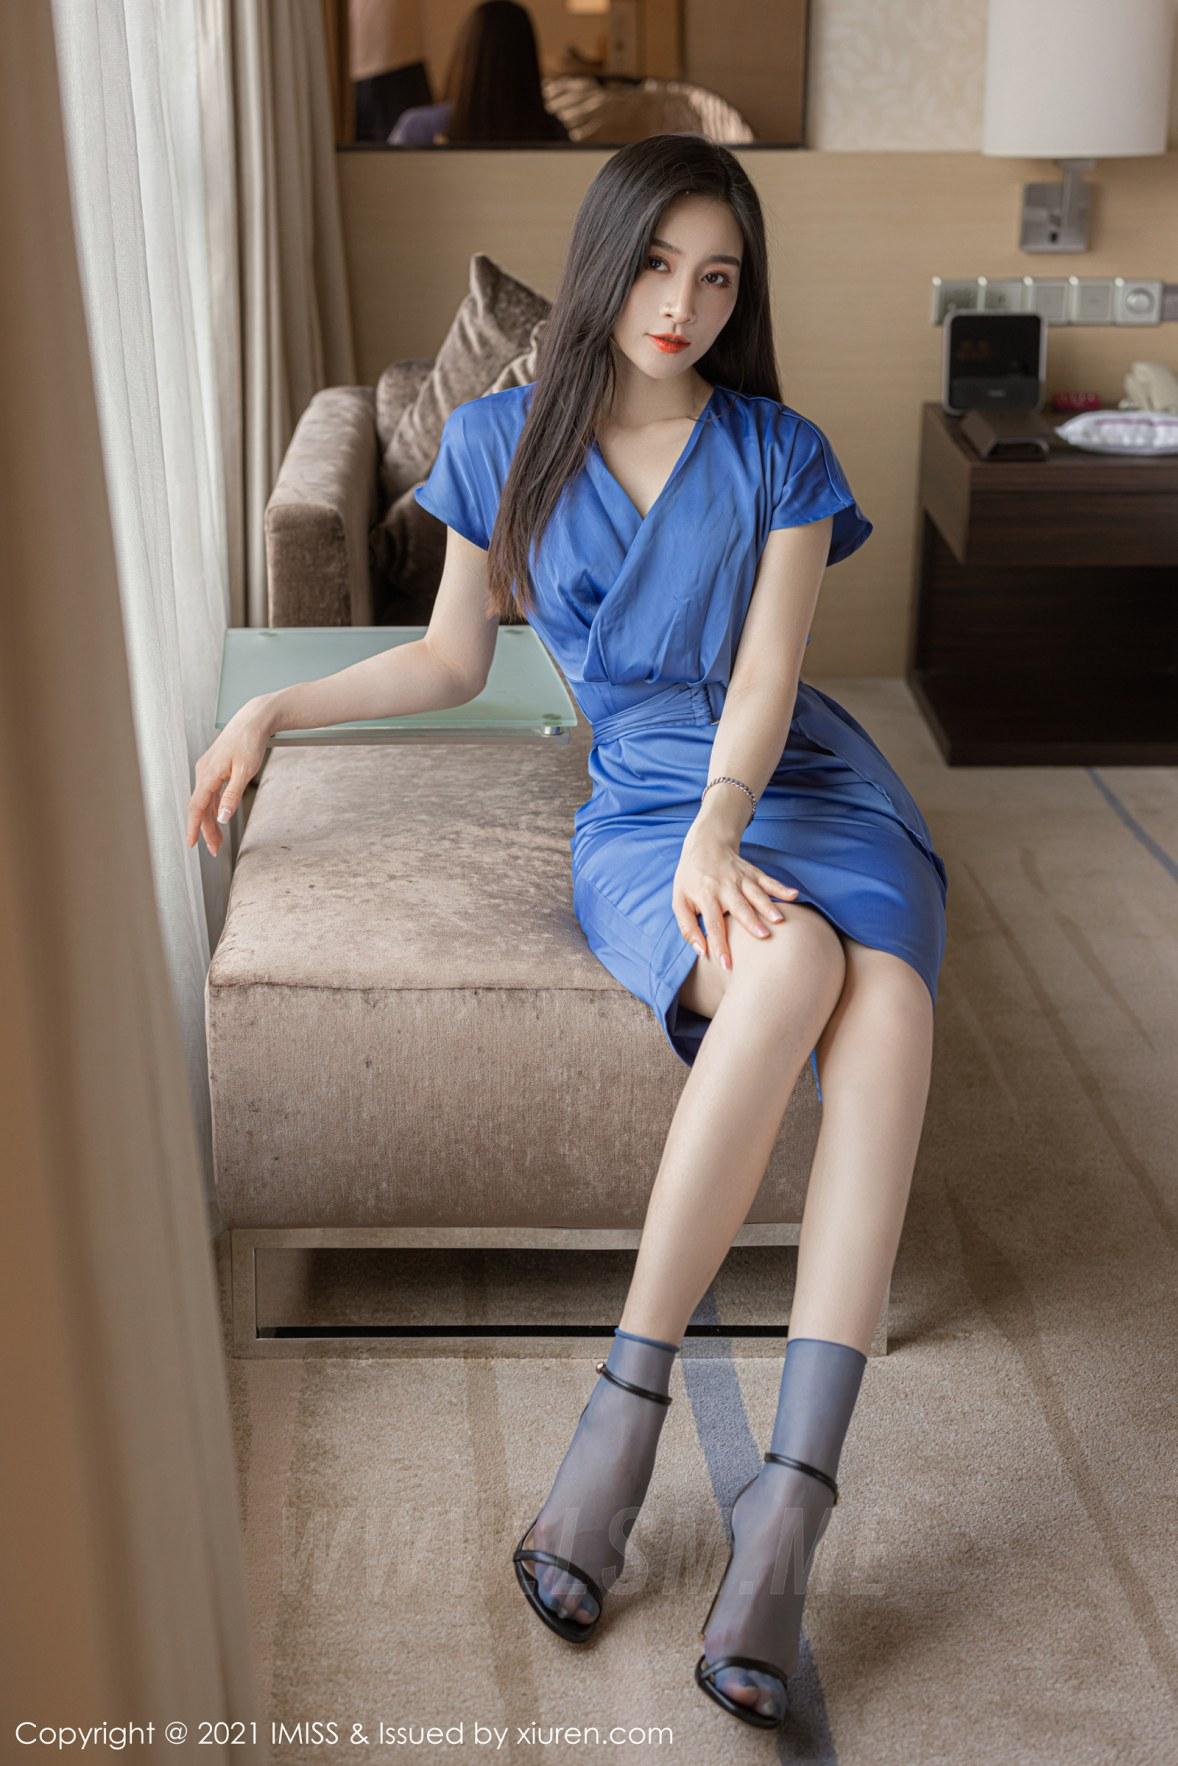 IMiss 爱蜜社 Vol.626 气质美女多姿礼裙 Vanessa 性感写真3 - 3